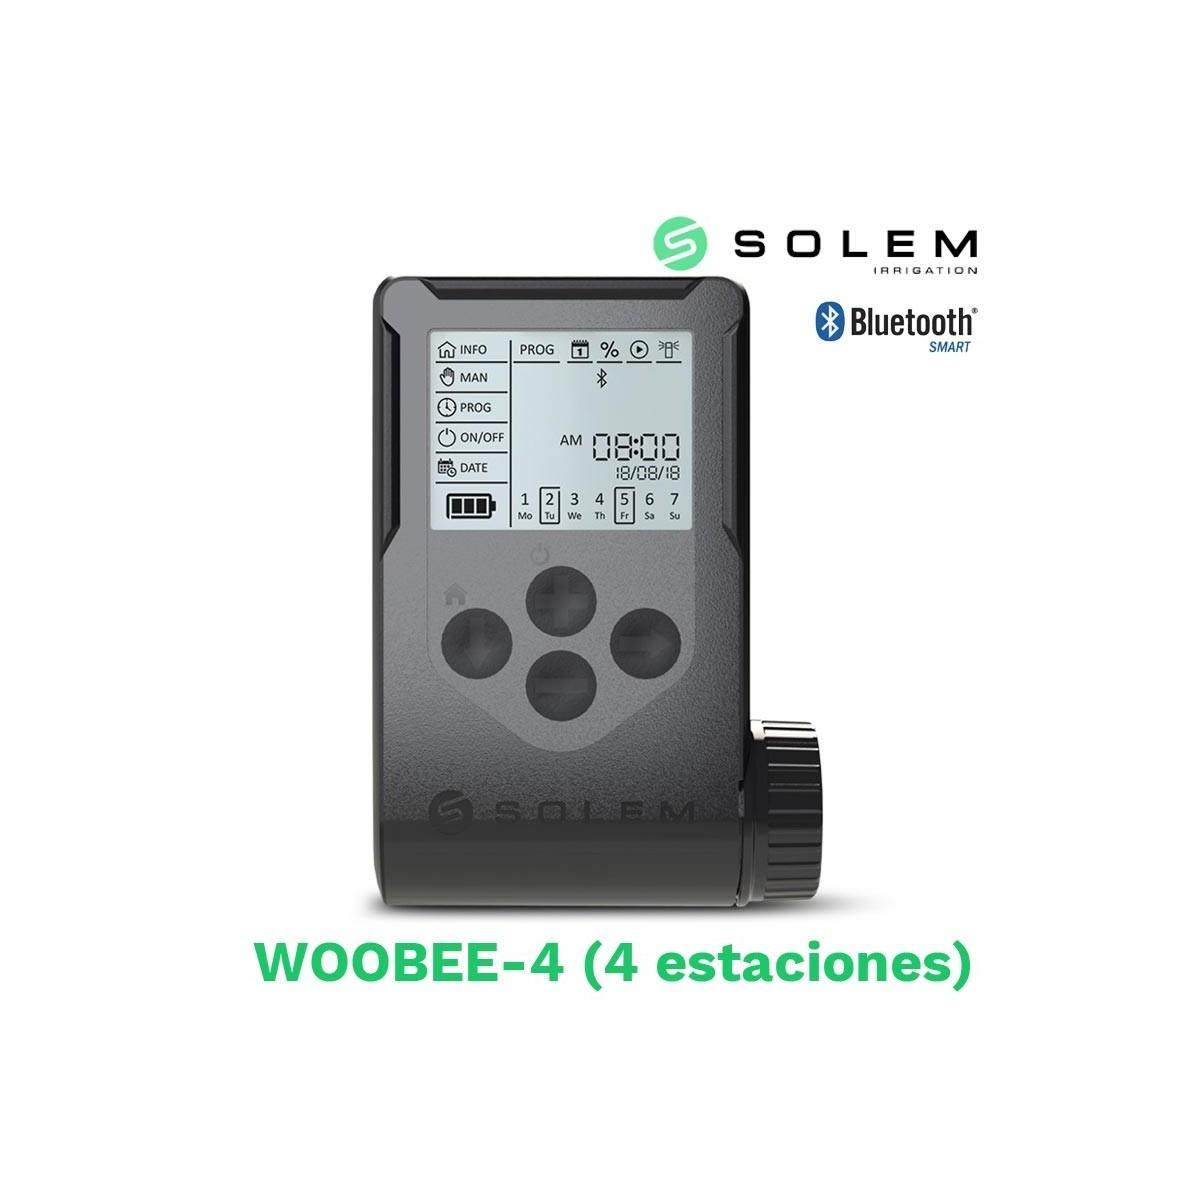 Programador solem woobee 4 estaciones (bateria/pantalla/bluetooth)